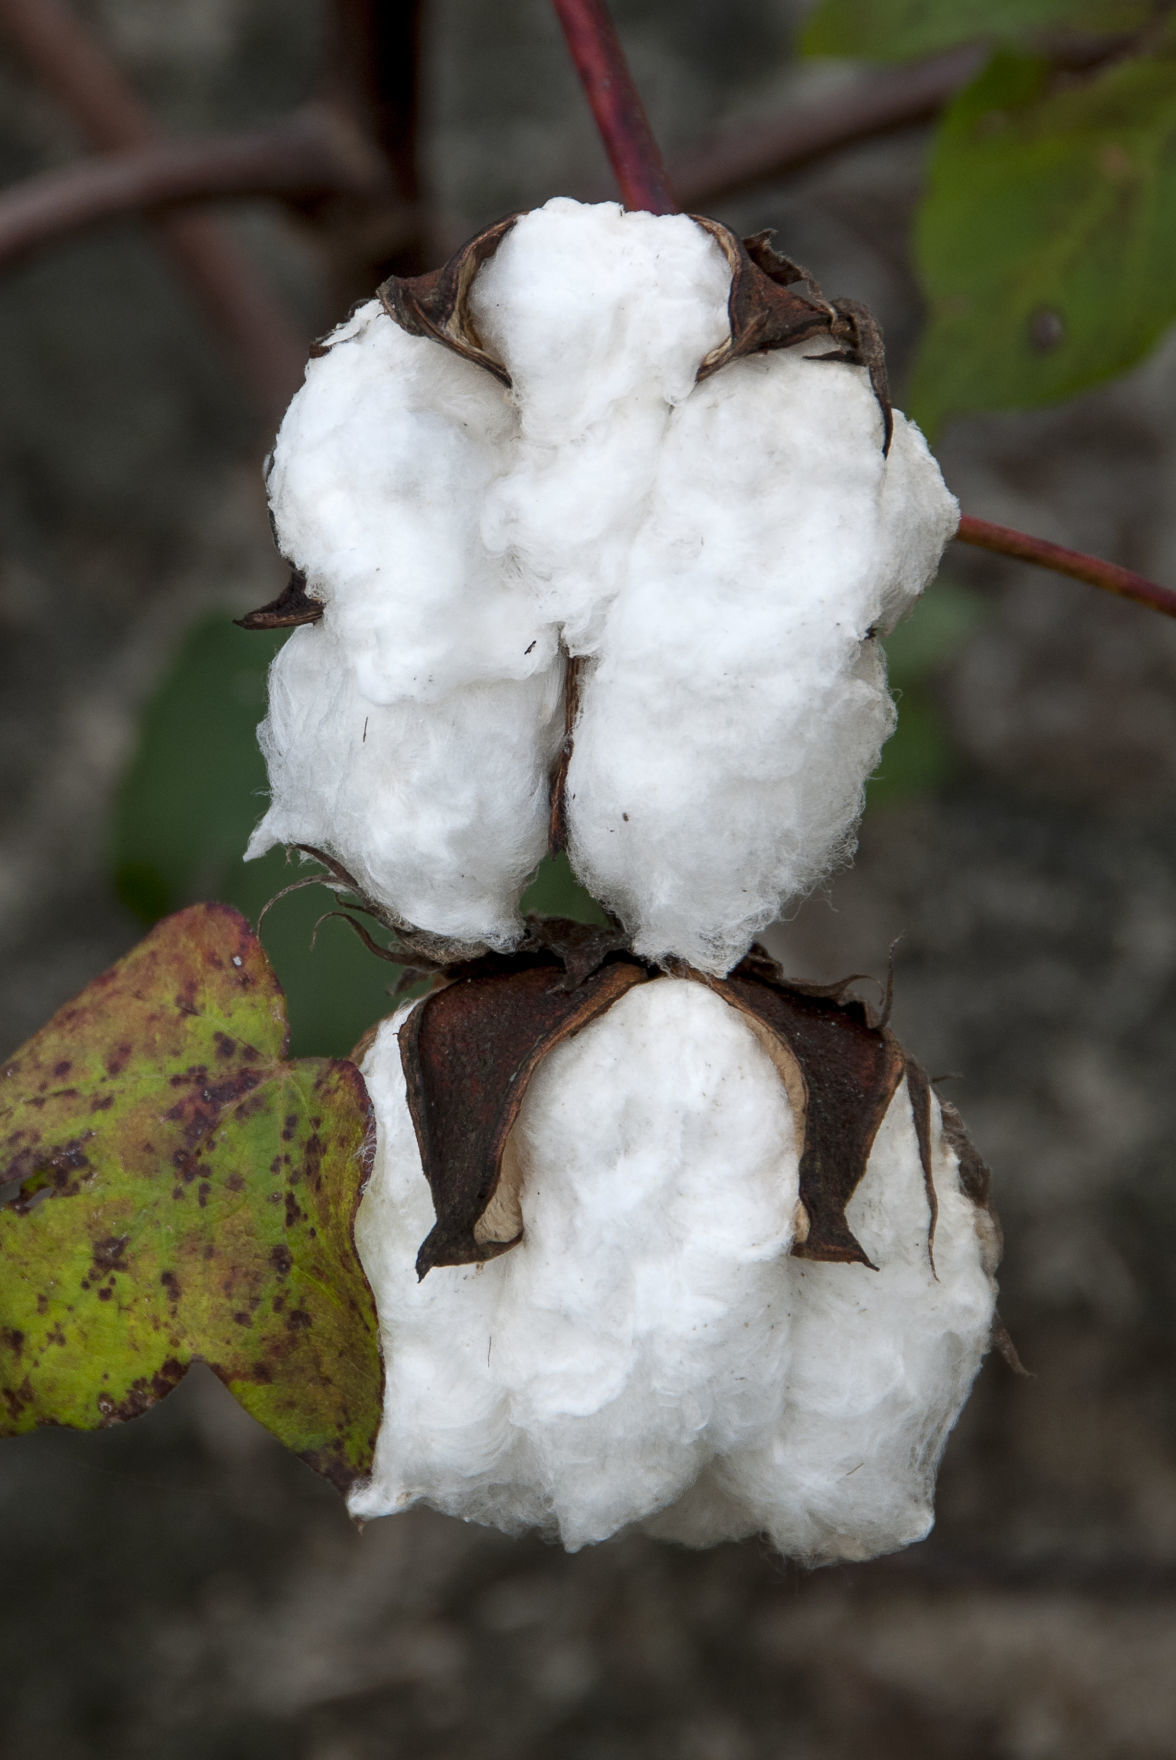 Cotton: The Soft, Dangerous Beauty of the Past